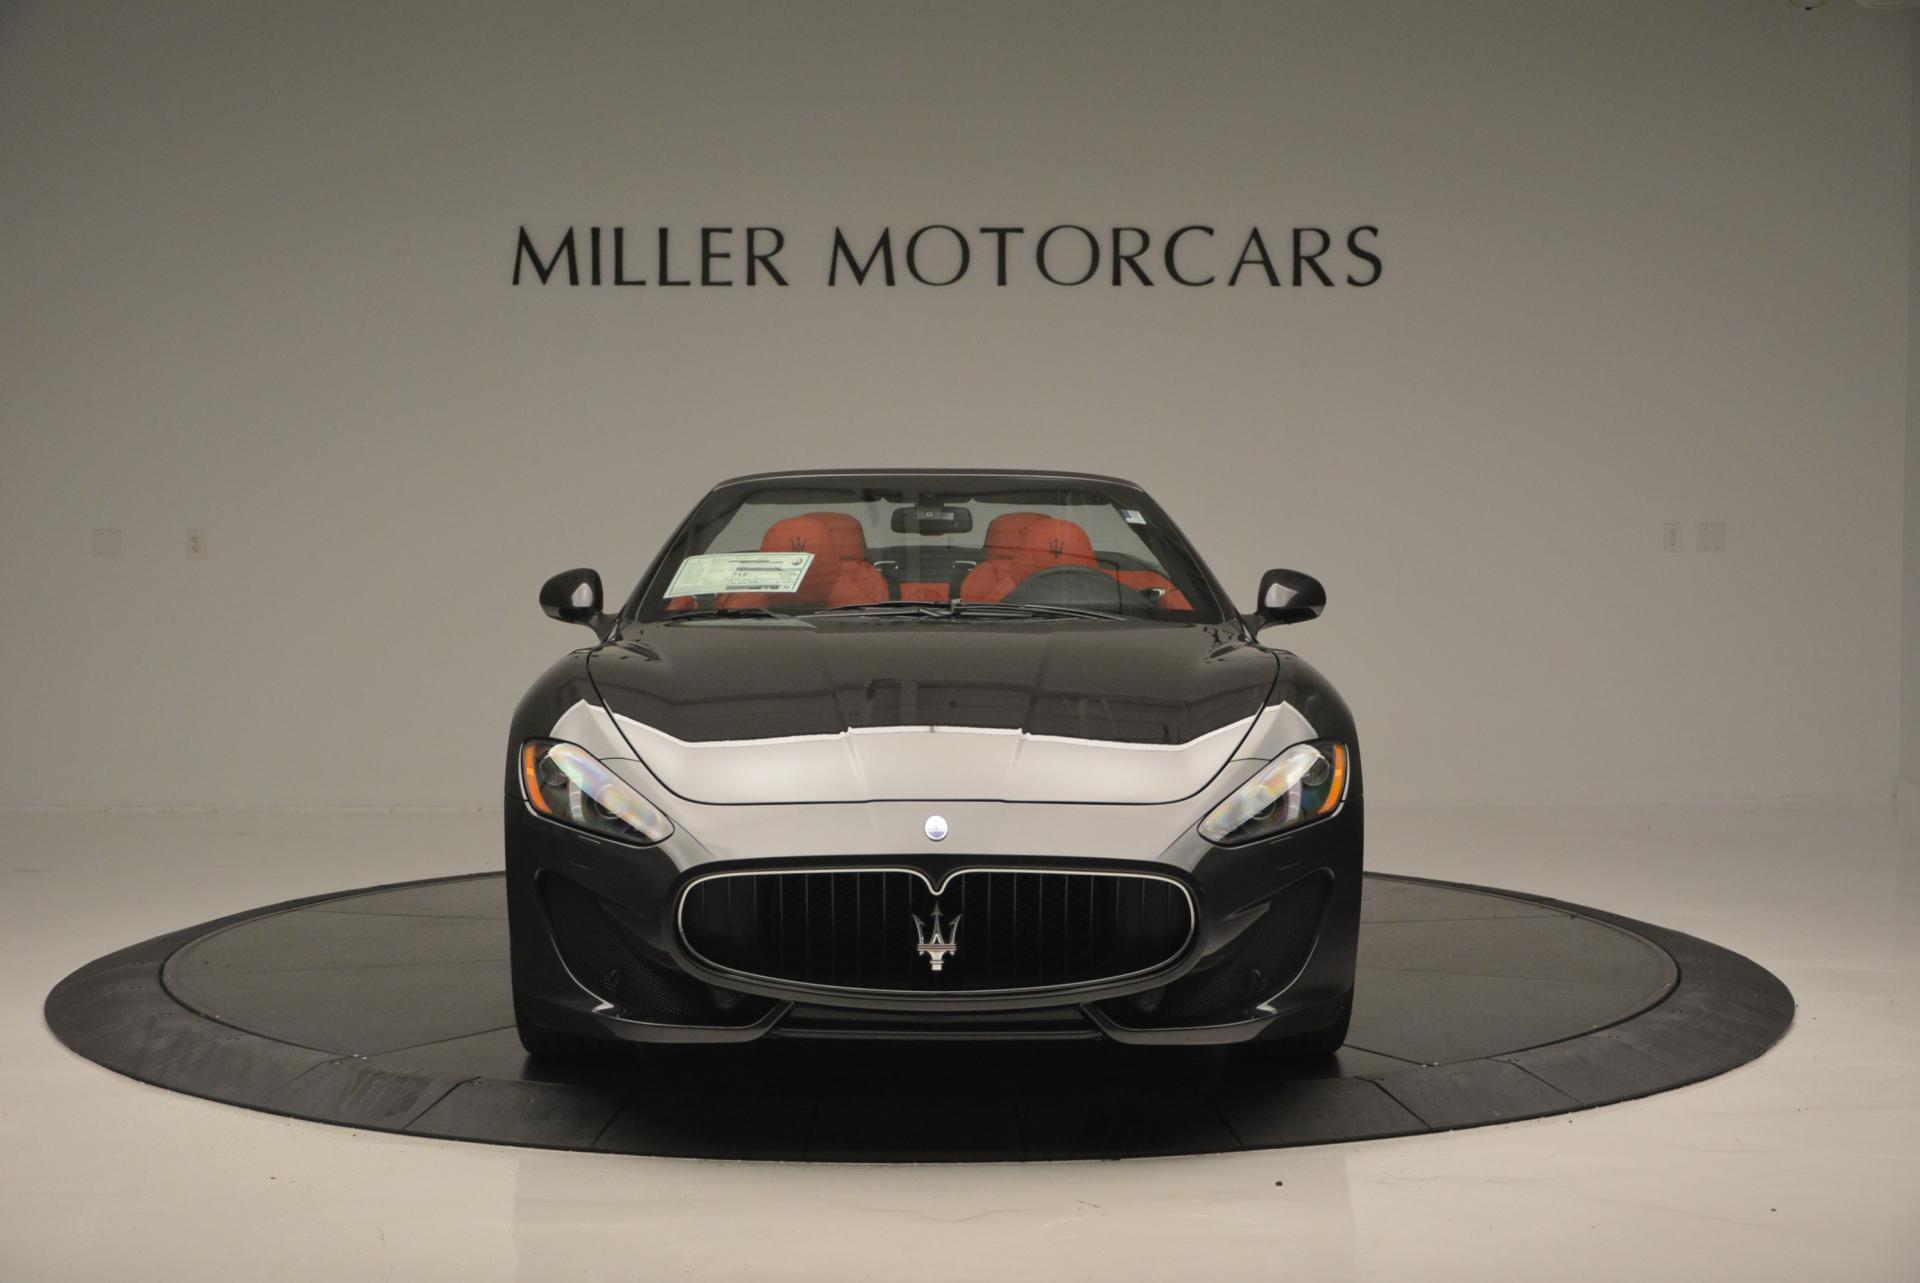 New 2017 Maserati GranTurismo Convertible Sport For Sale In Westport, CT 156_p16